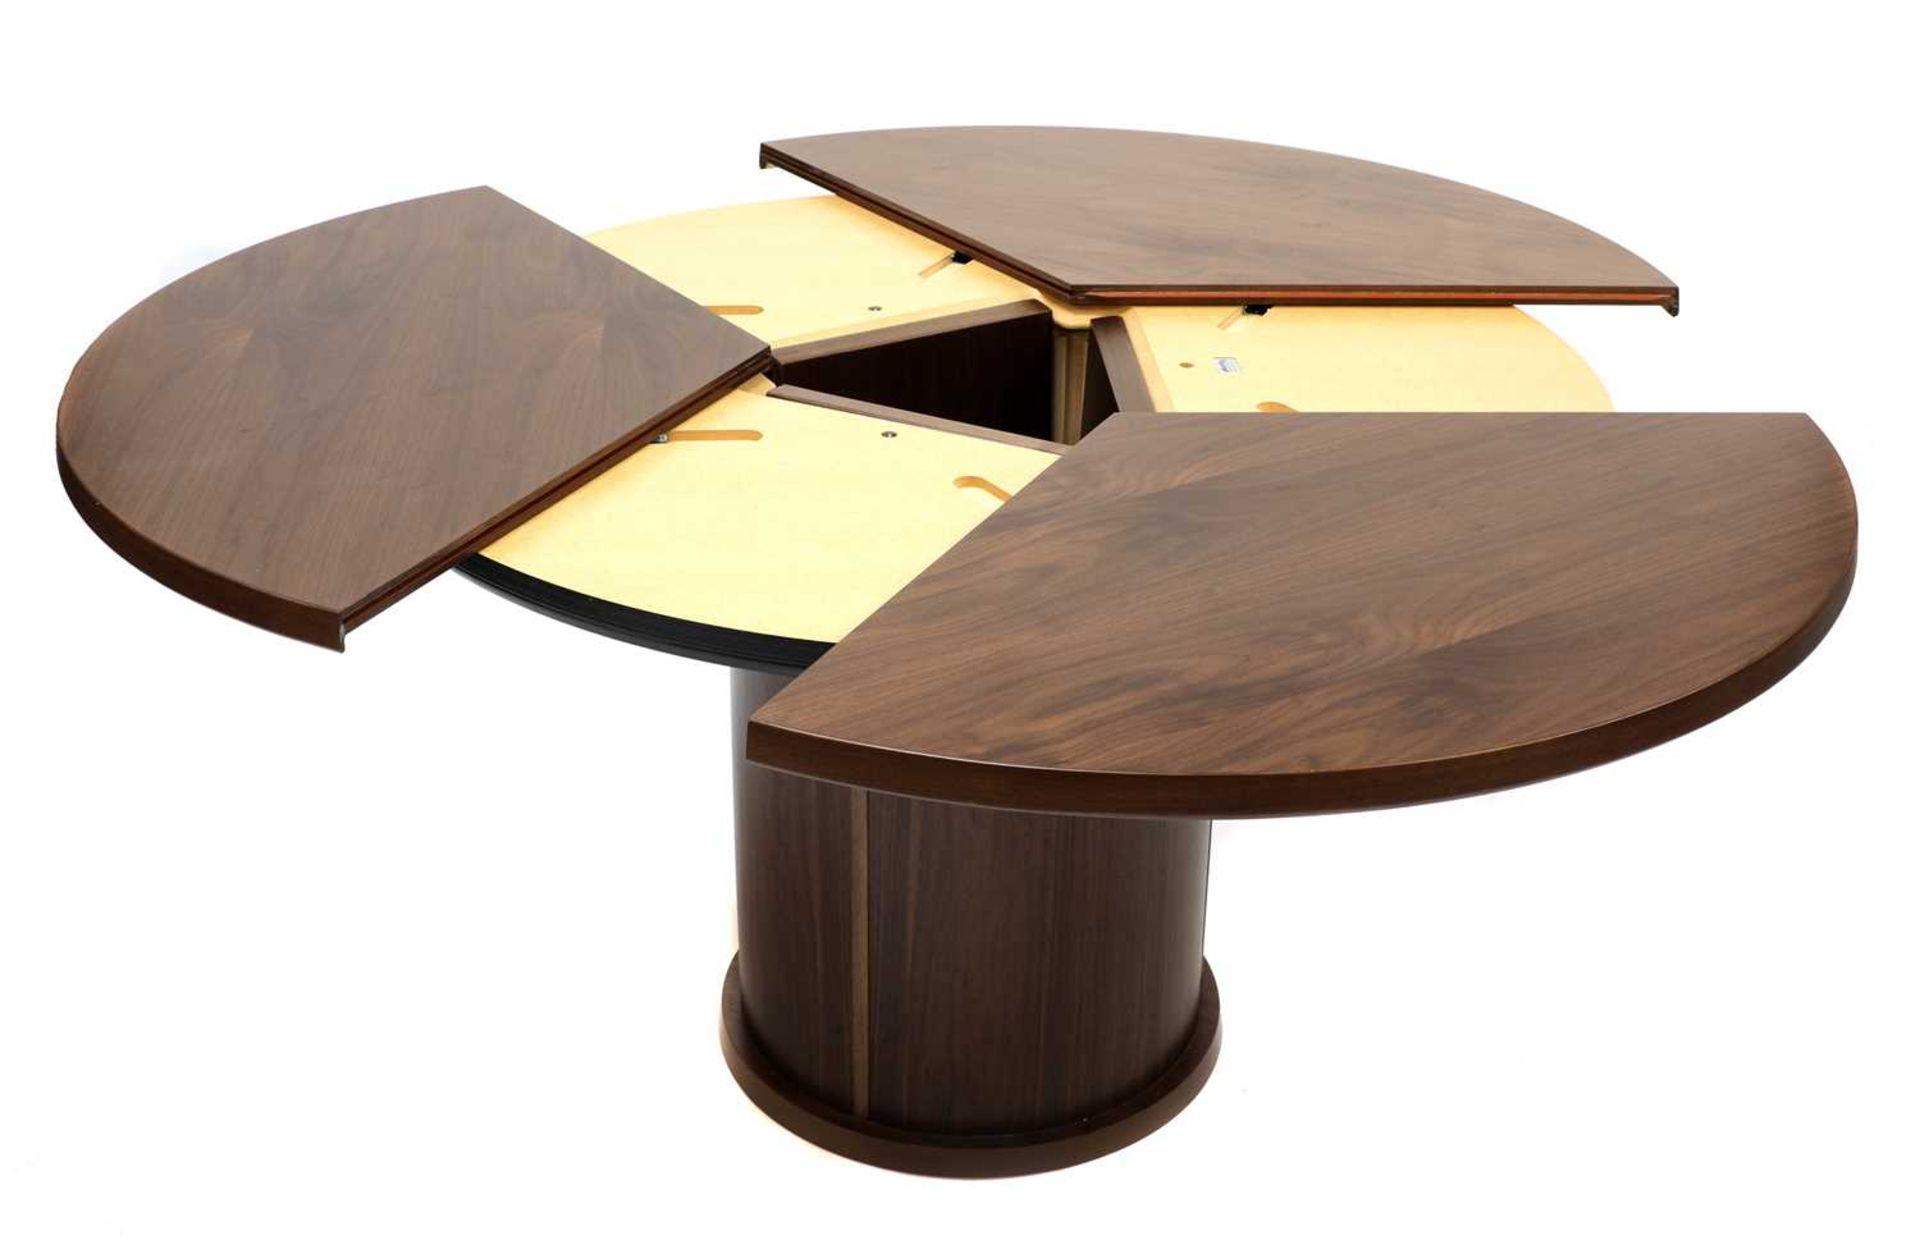 A Skovby 'Confide' walnut veneered extending circular dining table - Image 2 of 7